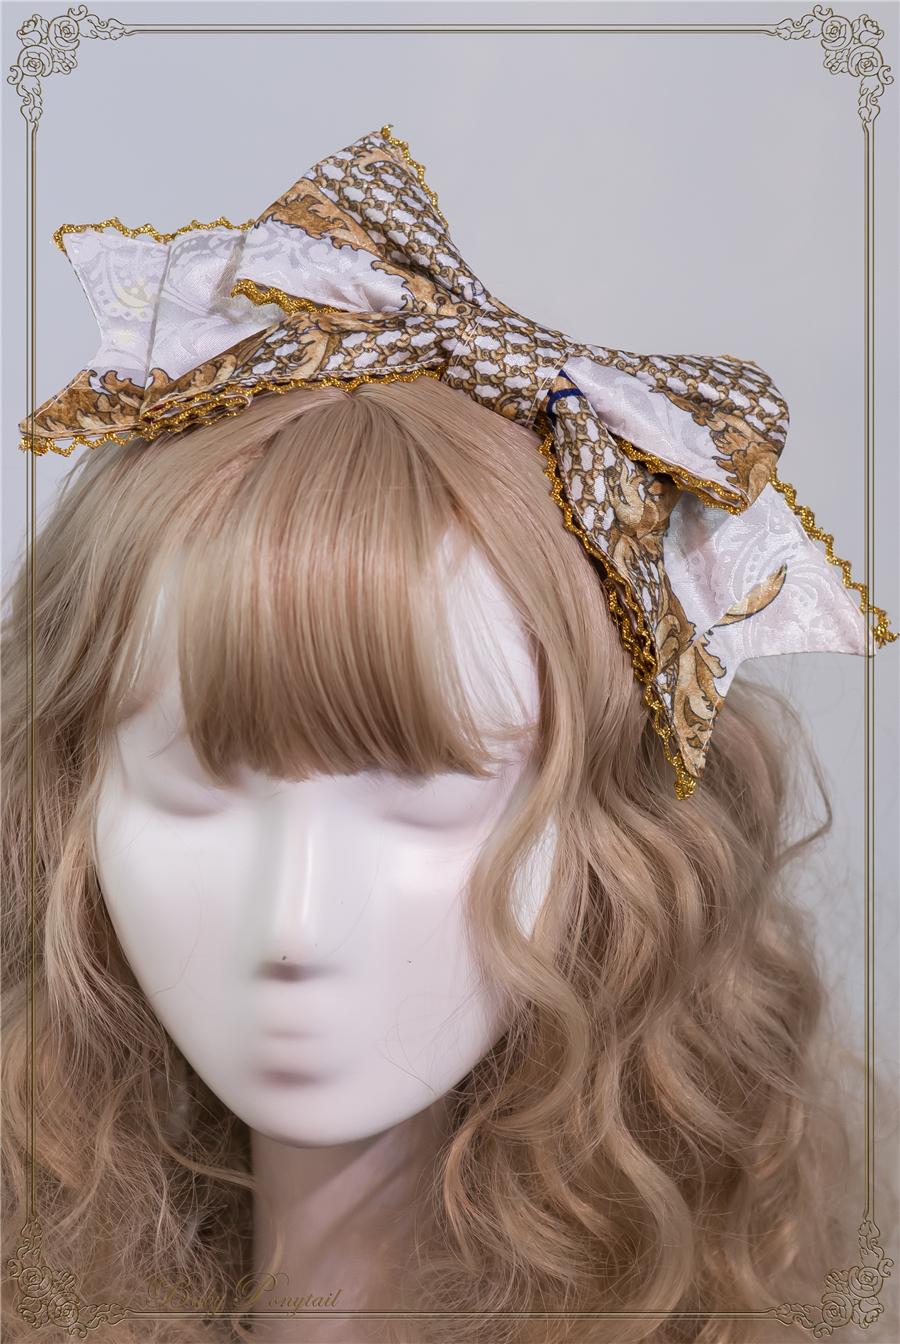 Baby Ponytail_Stock photo_Circus Princess_KC Silver_01.jpg